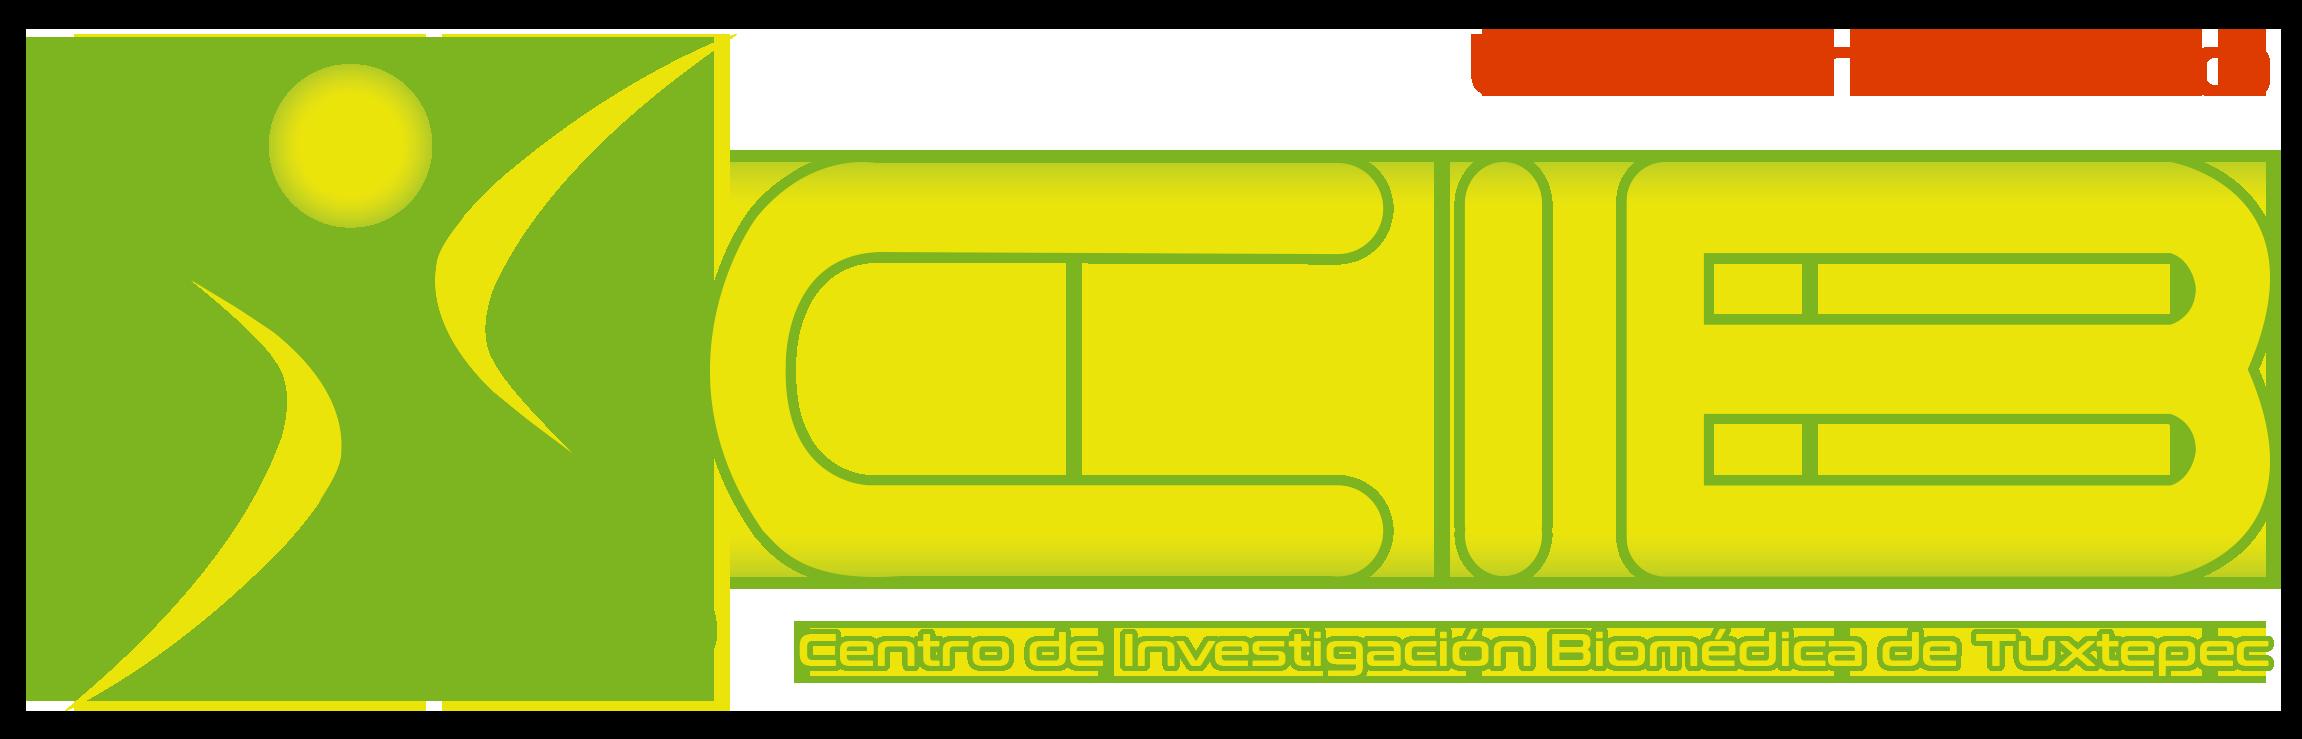 Logo CIB Nuevo PNG